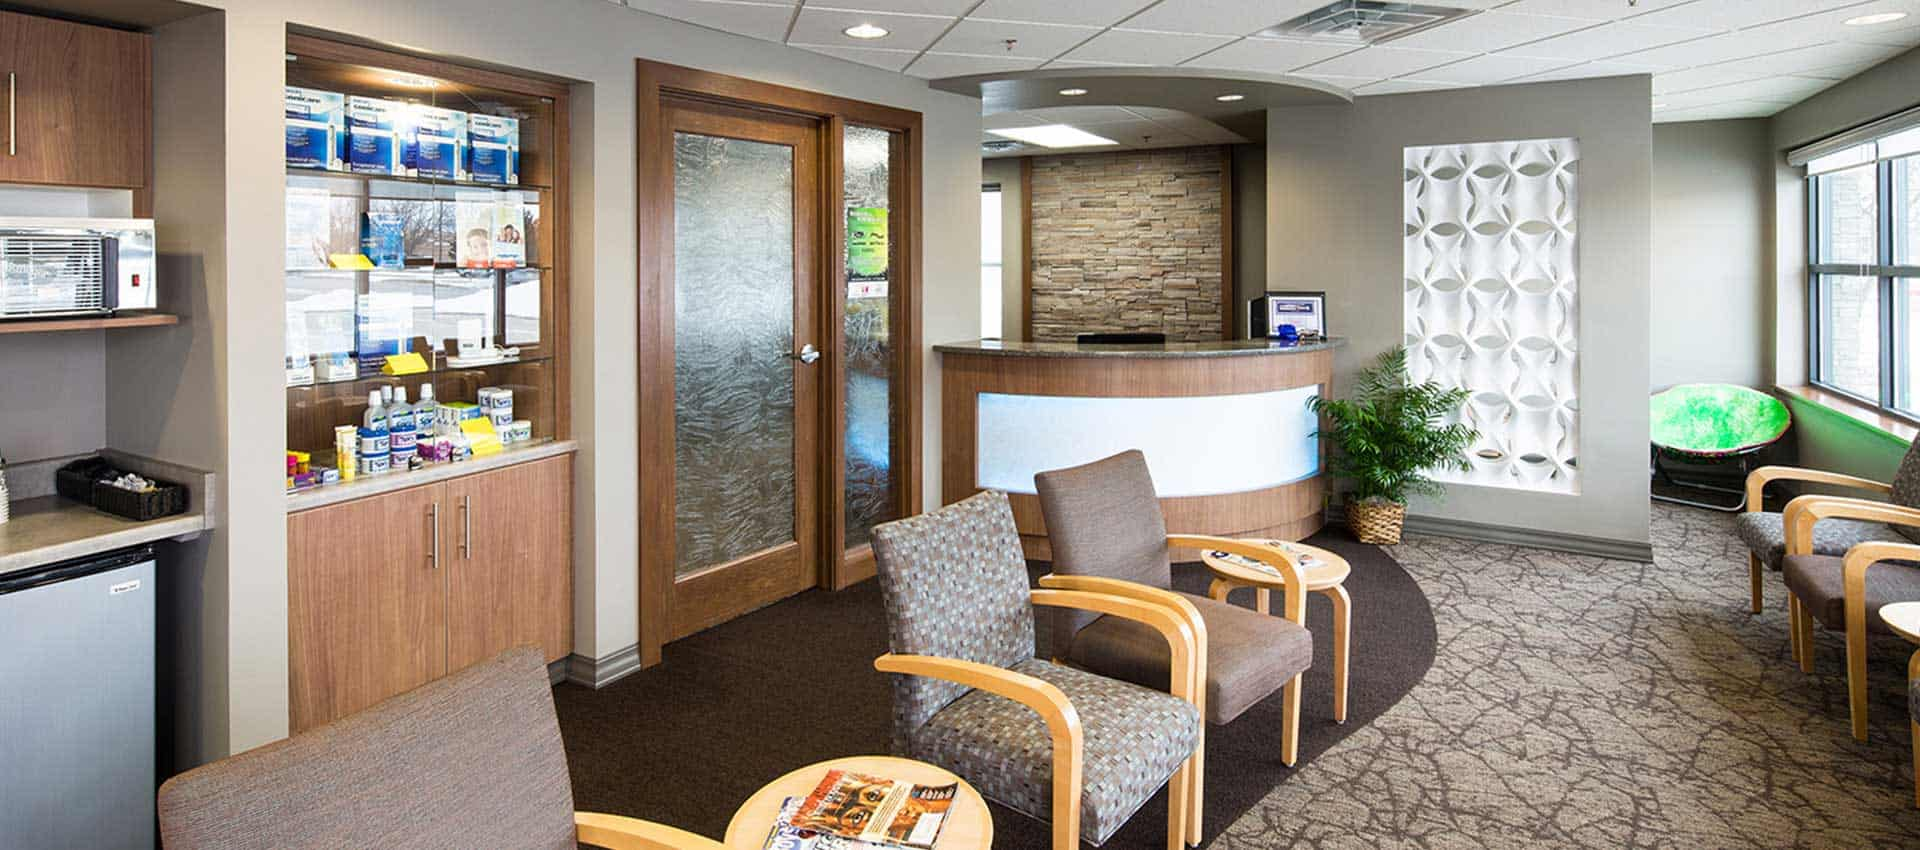 dental office waiting room - Dental Touch Associates in Cedar Rapids, IA